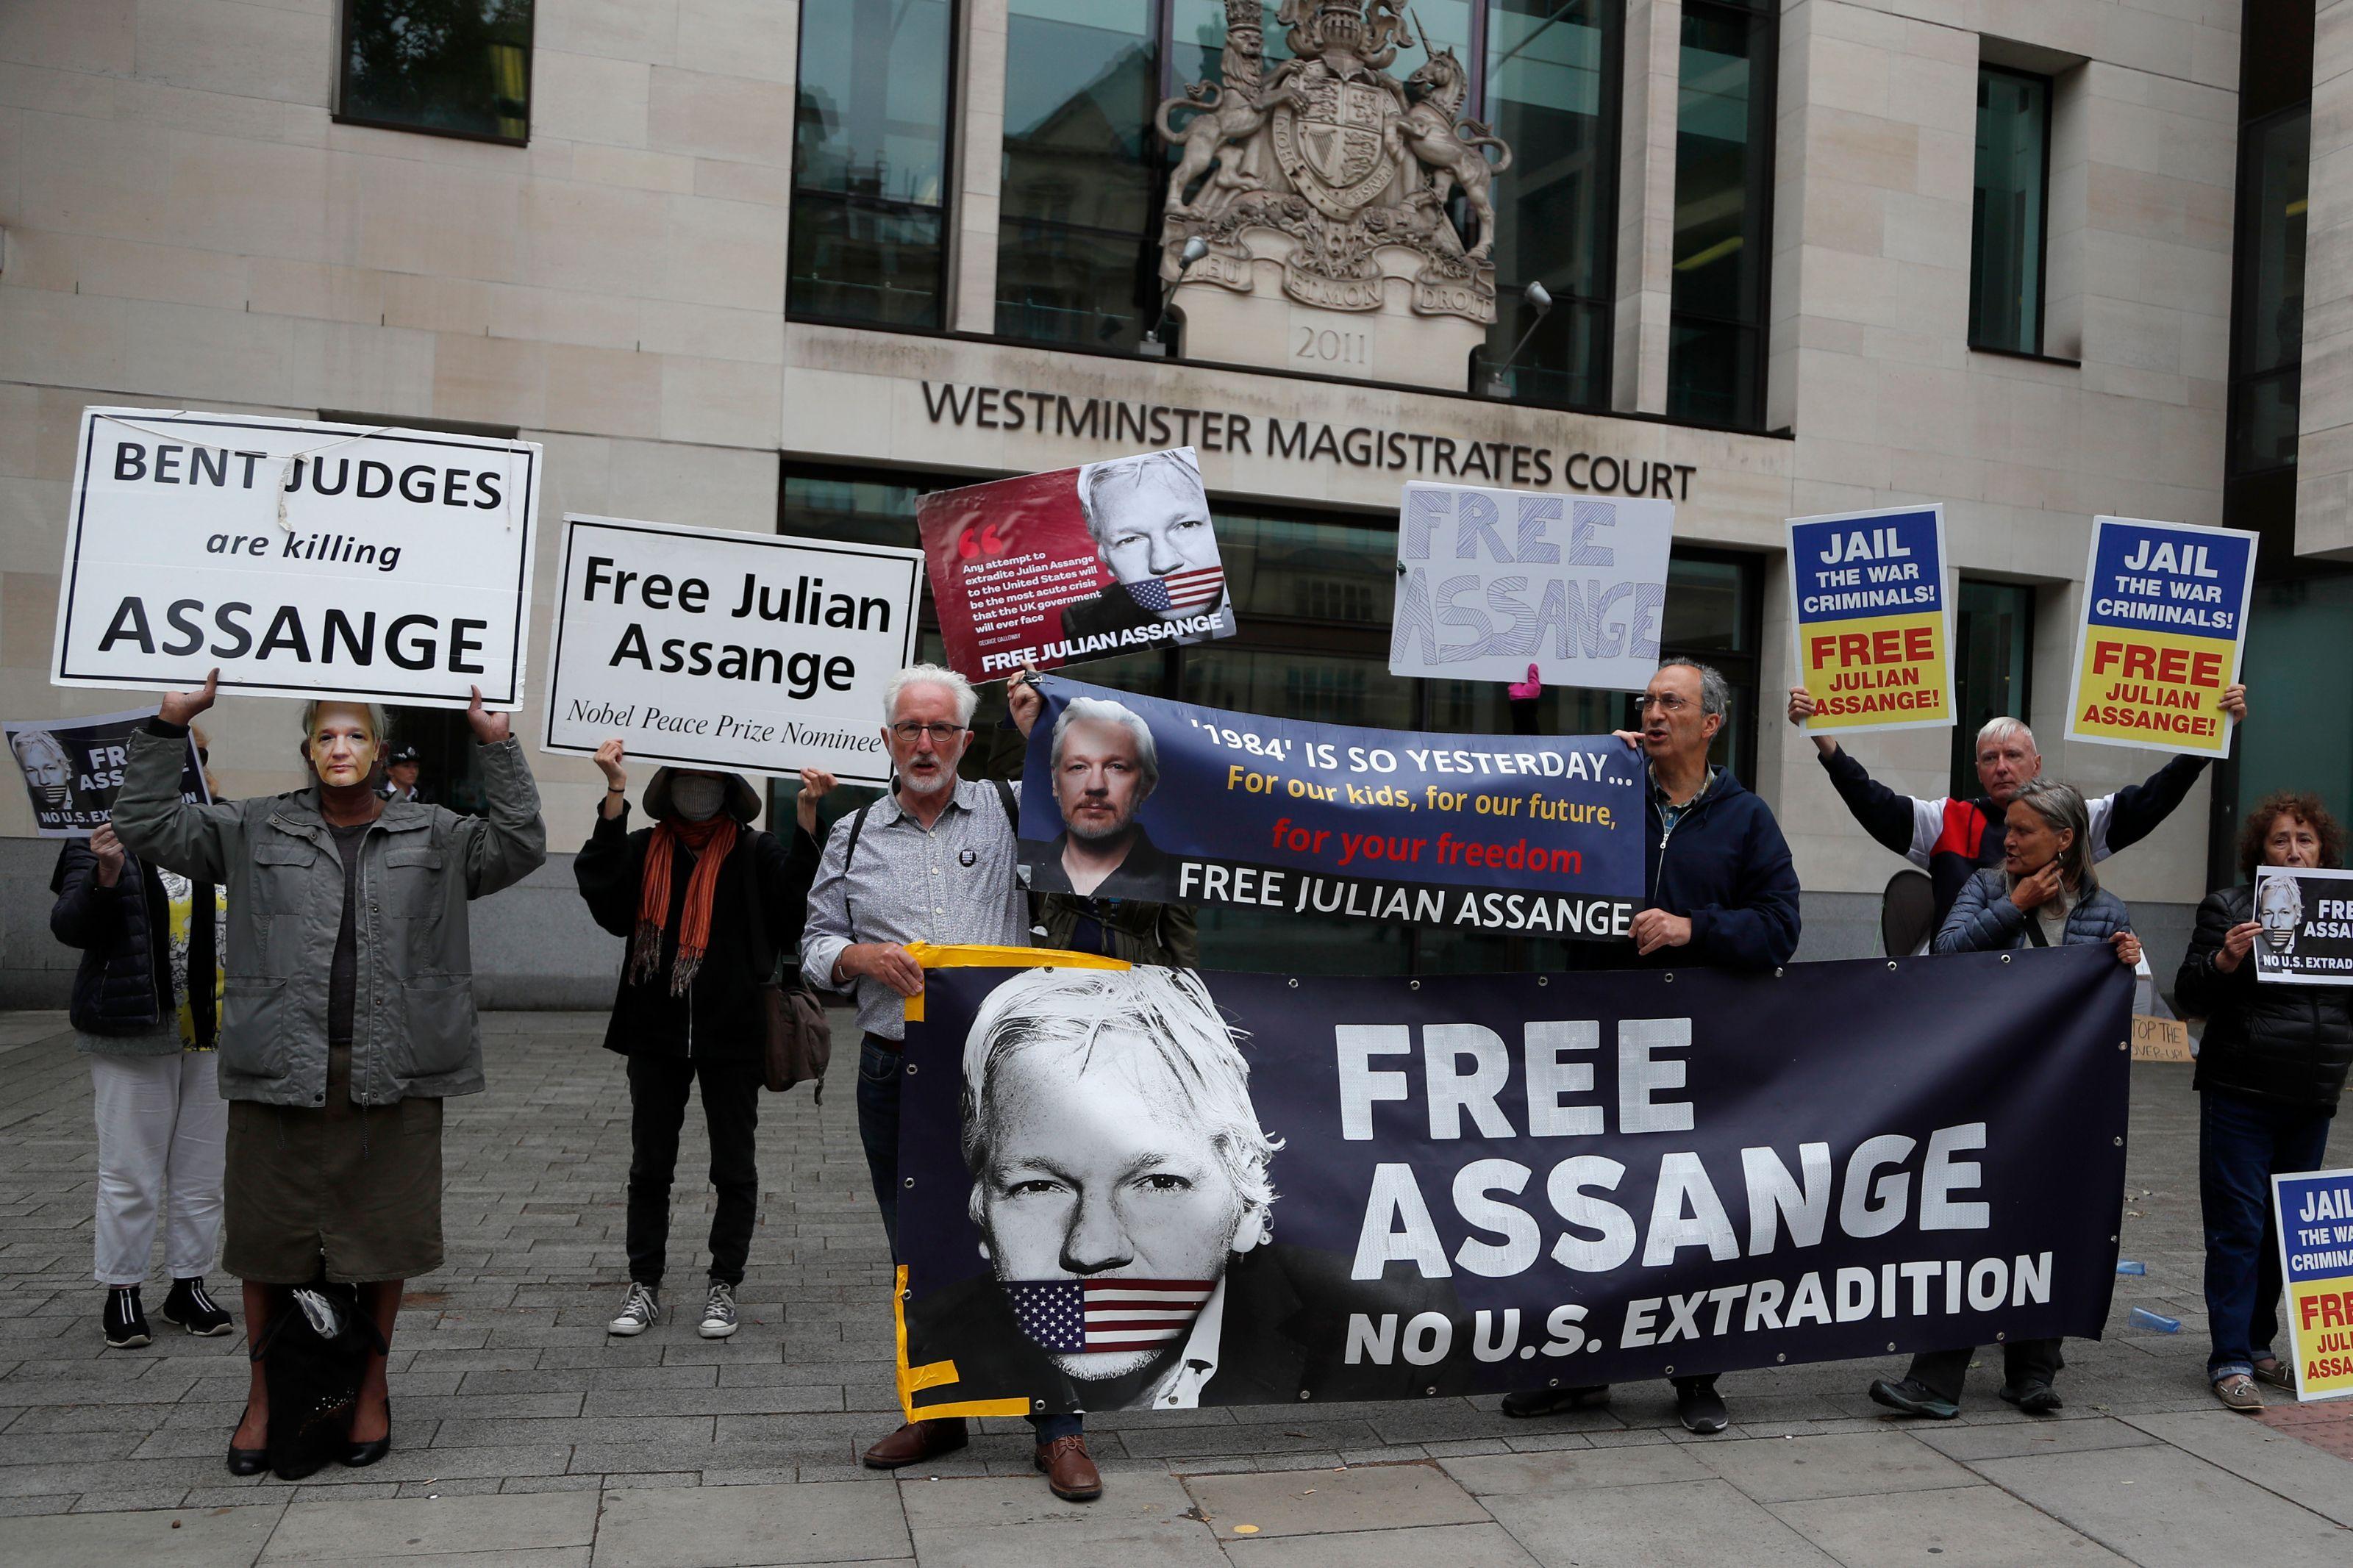 julian_assange_supporters_3200